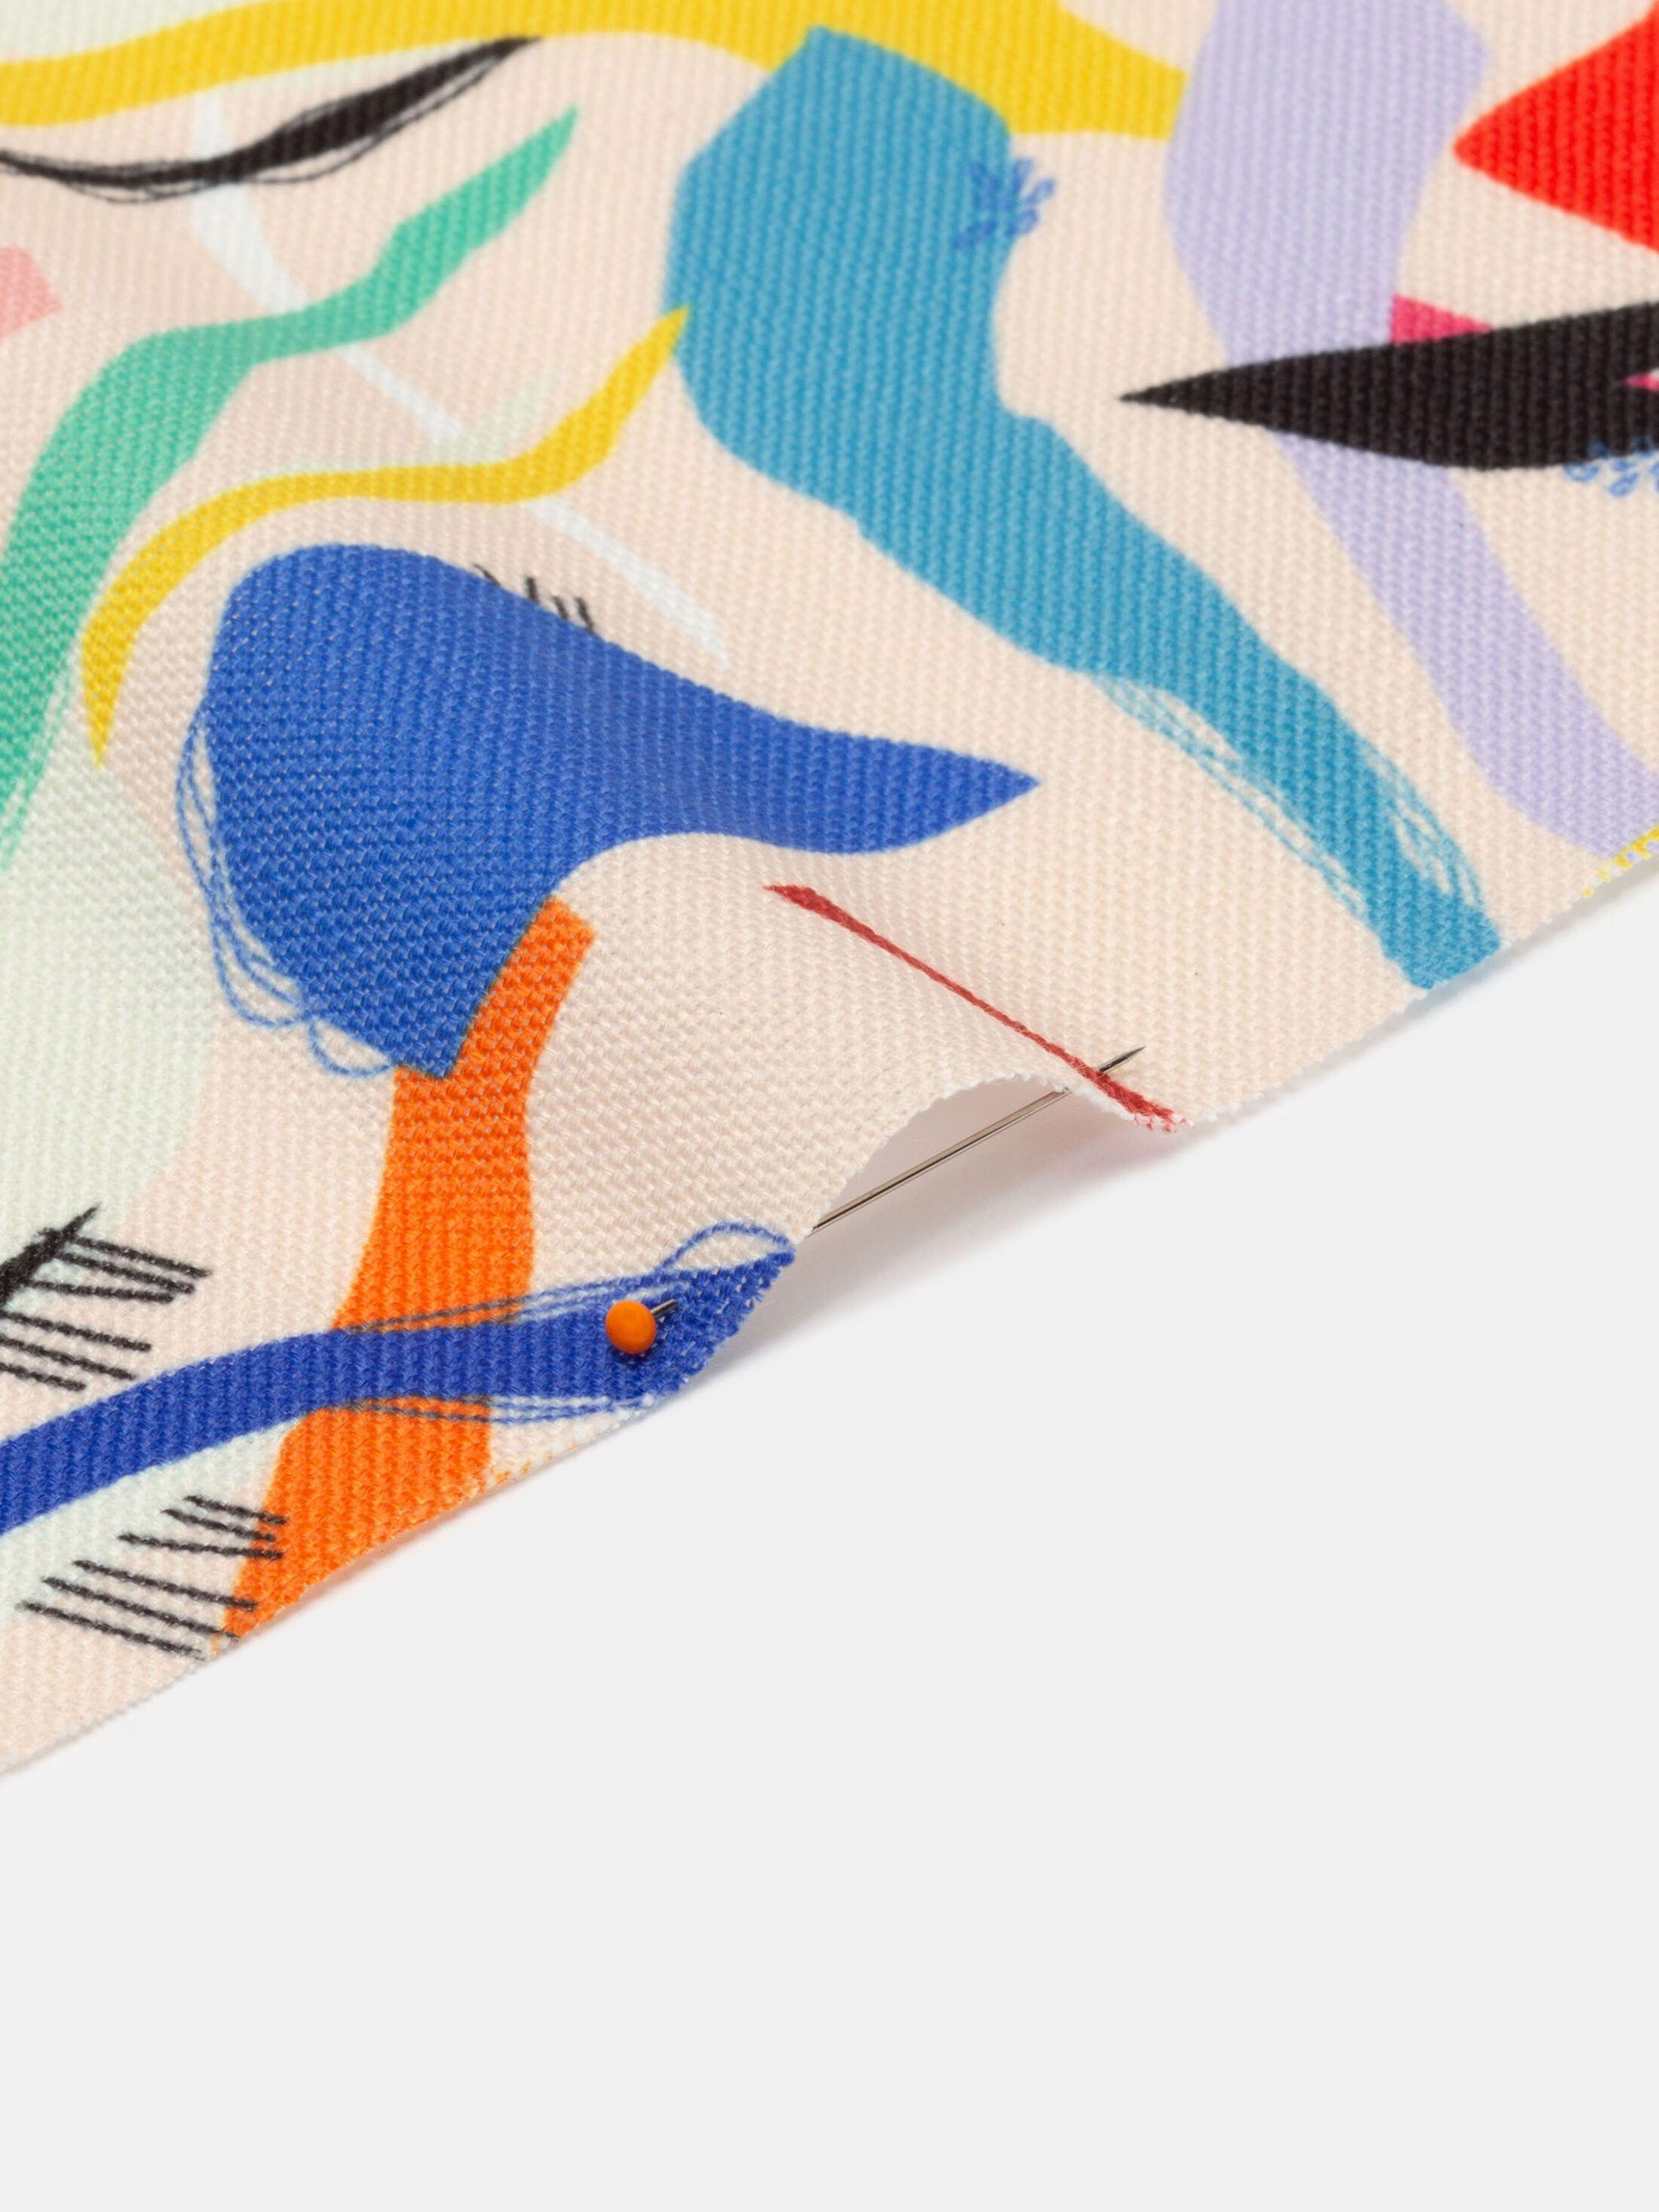 geweven linnenstof met print